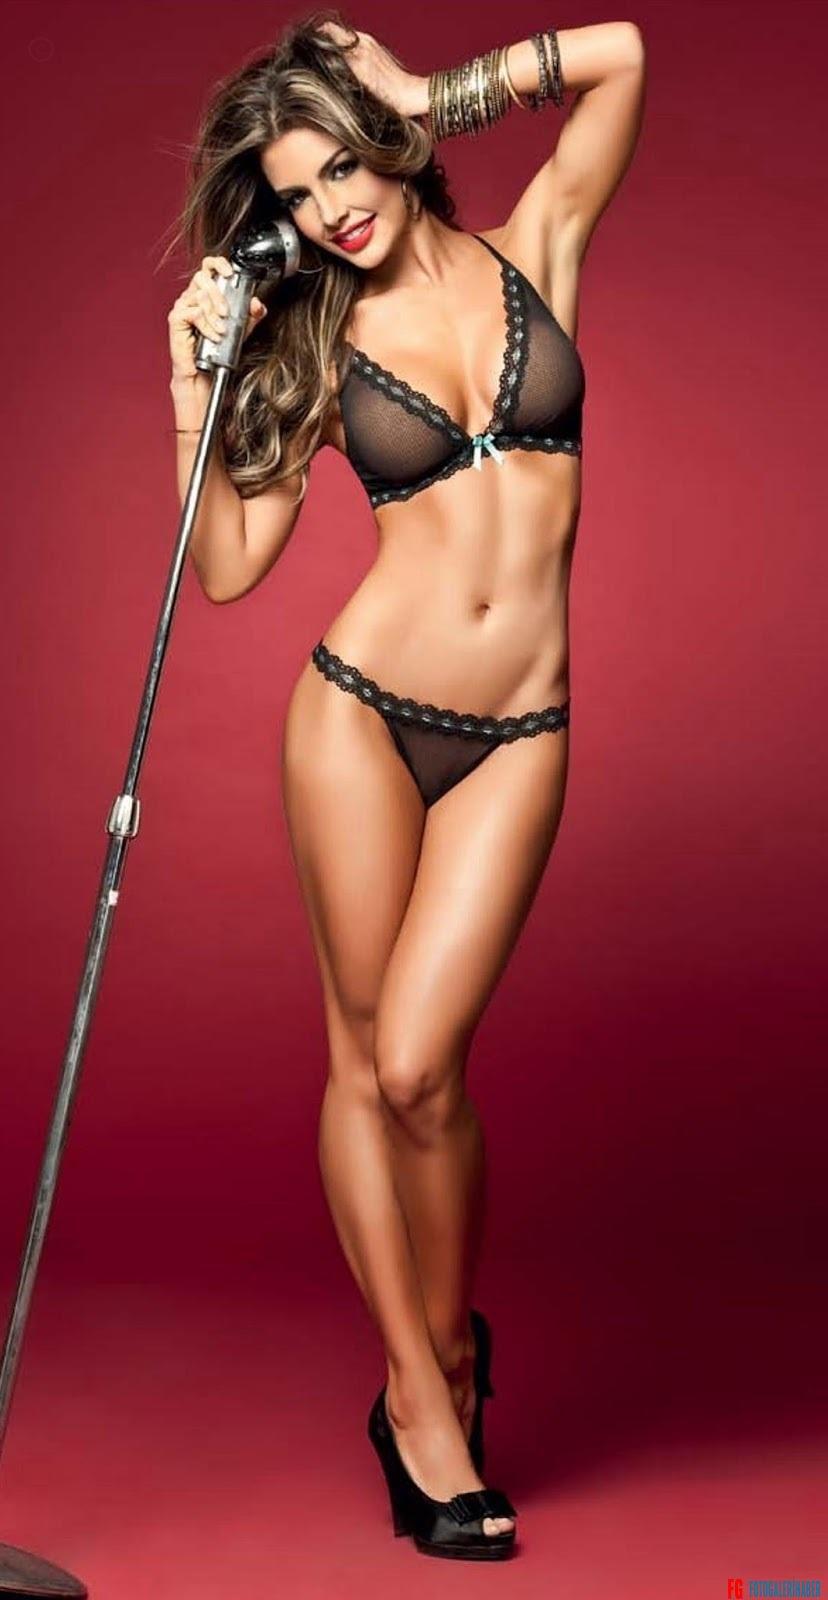 natalia-velez-besame-lingerie-350589015